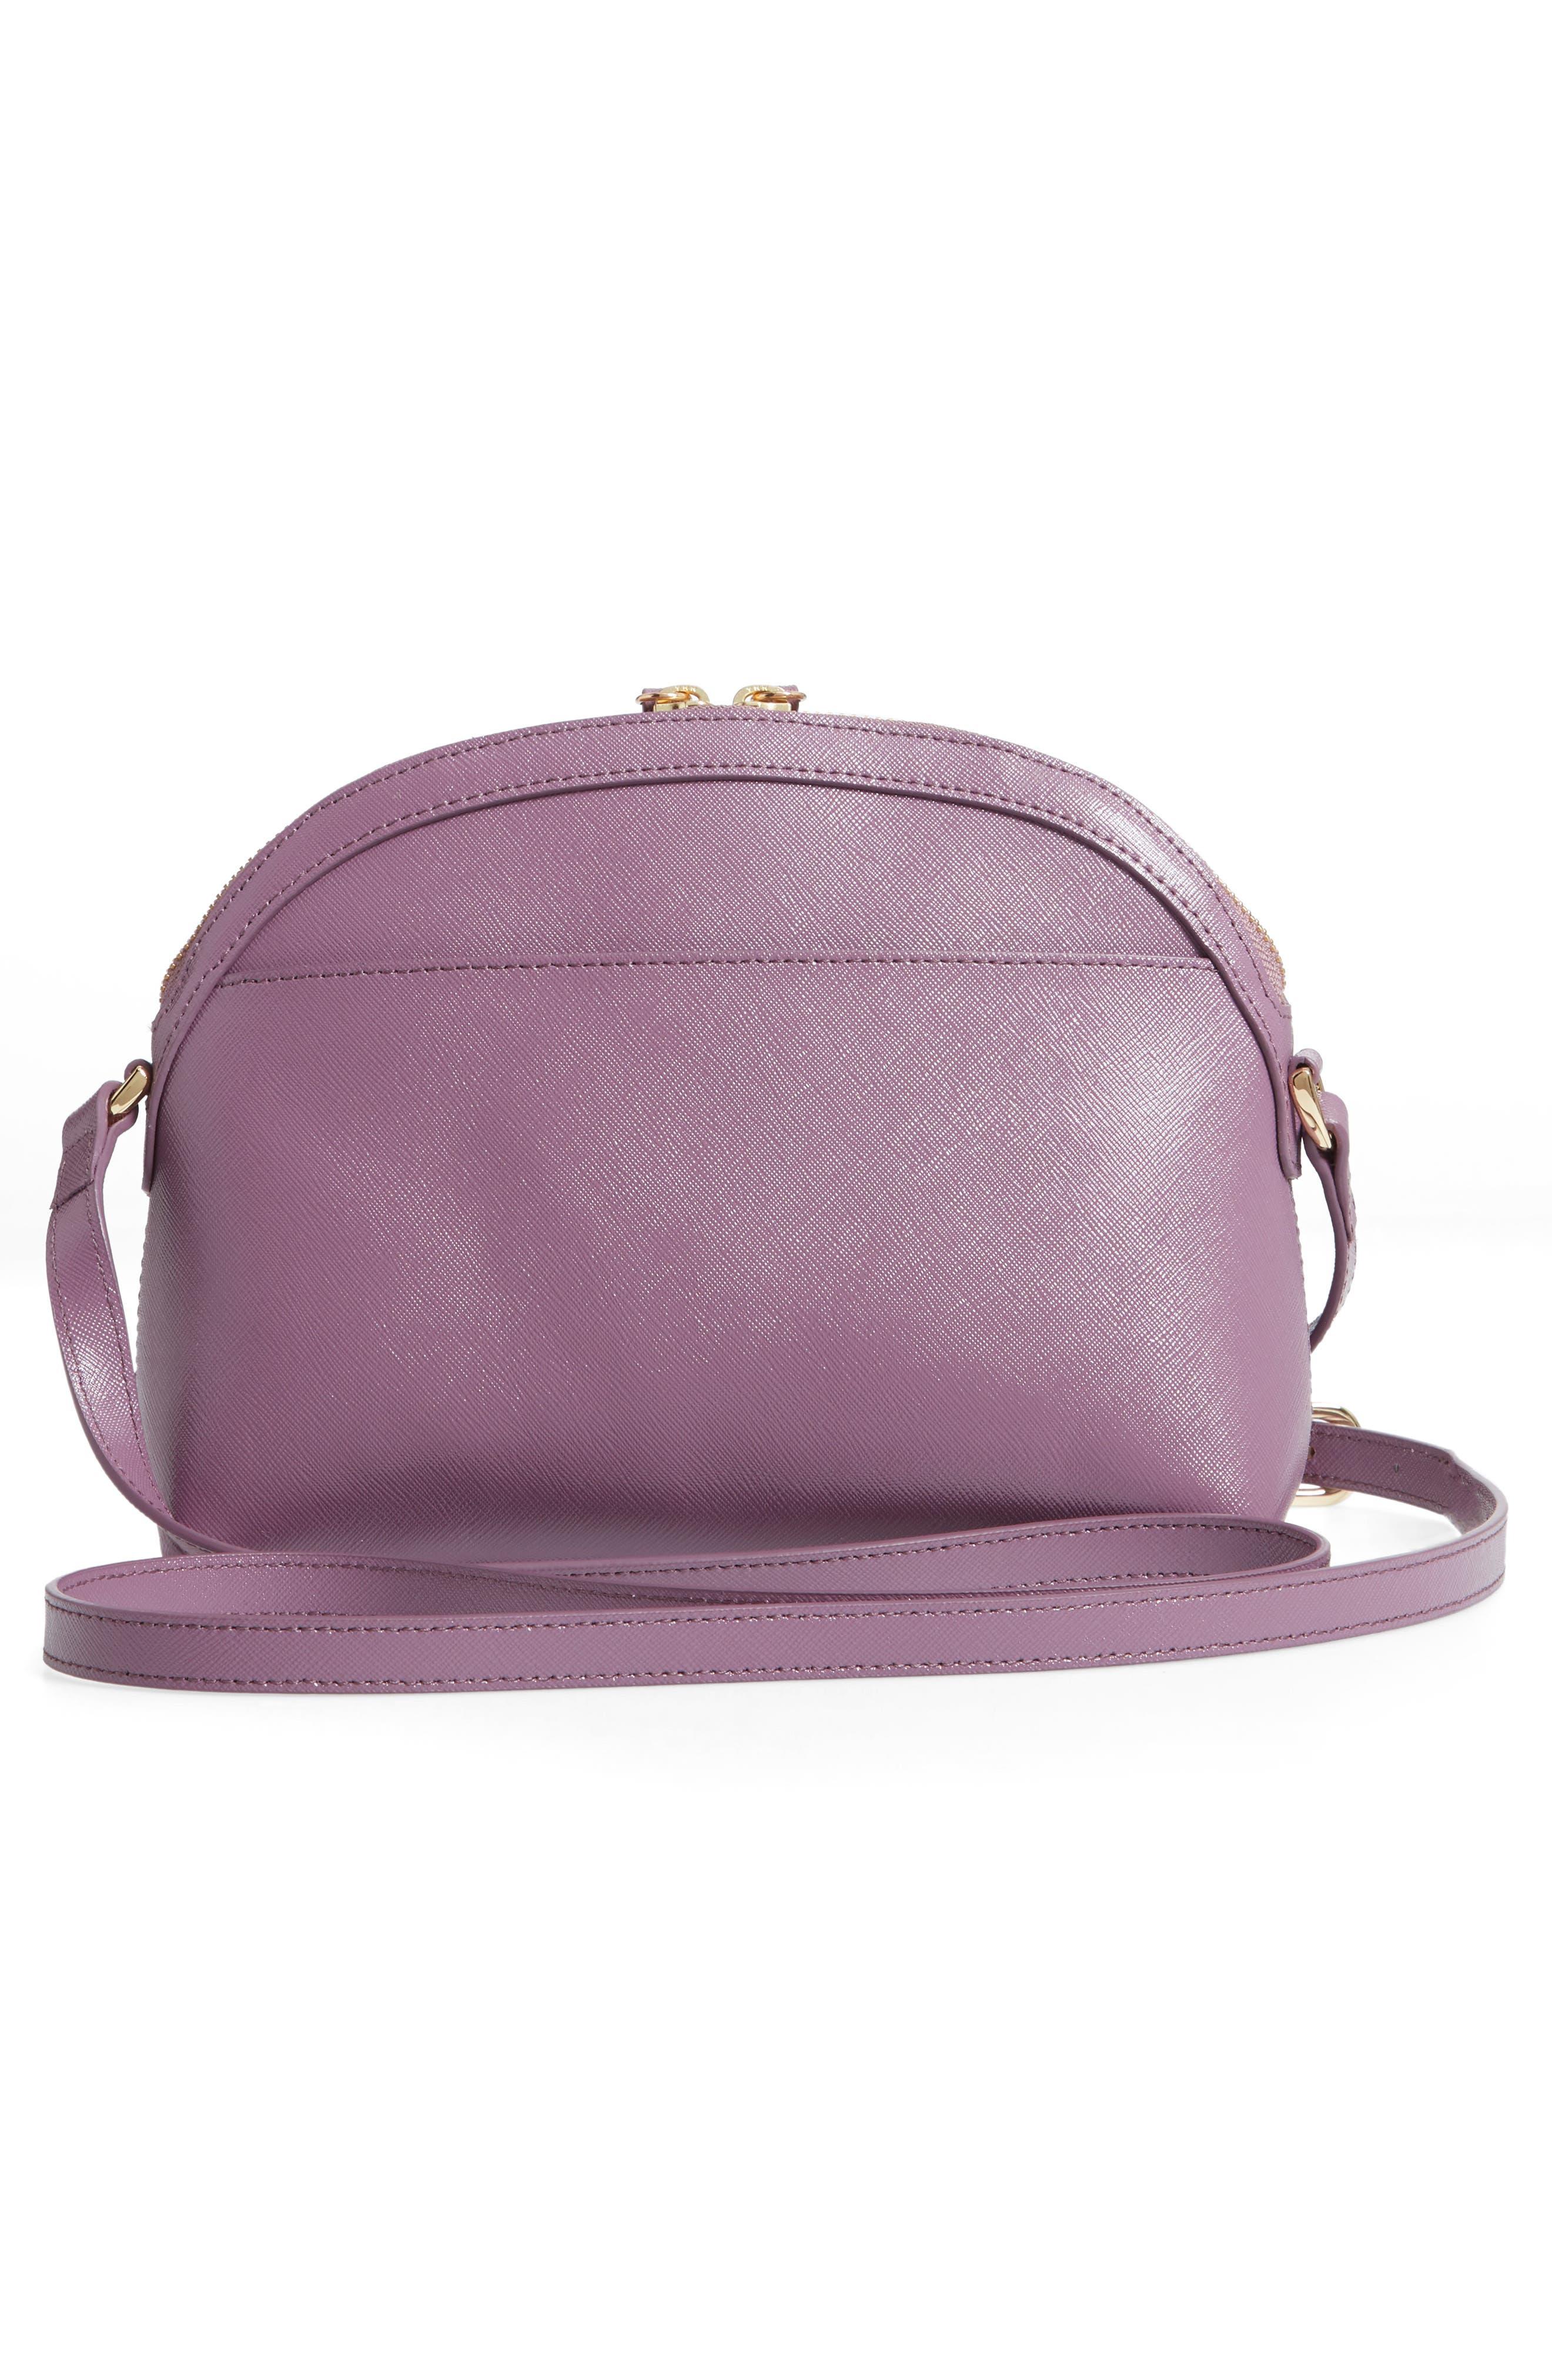 Isobel Half Moon Leather Crossbody Bag,                             Alternate thumbnail 3, color,                             PURPLE BETTA